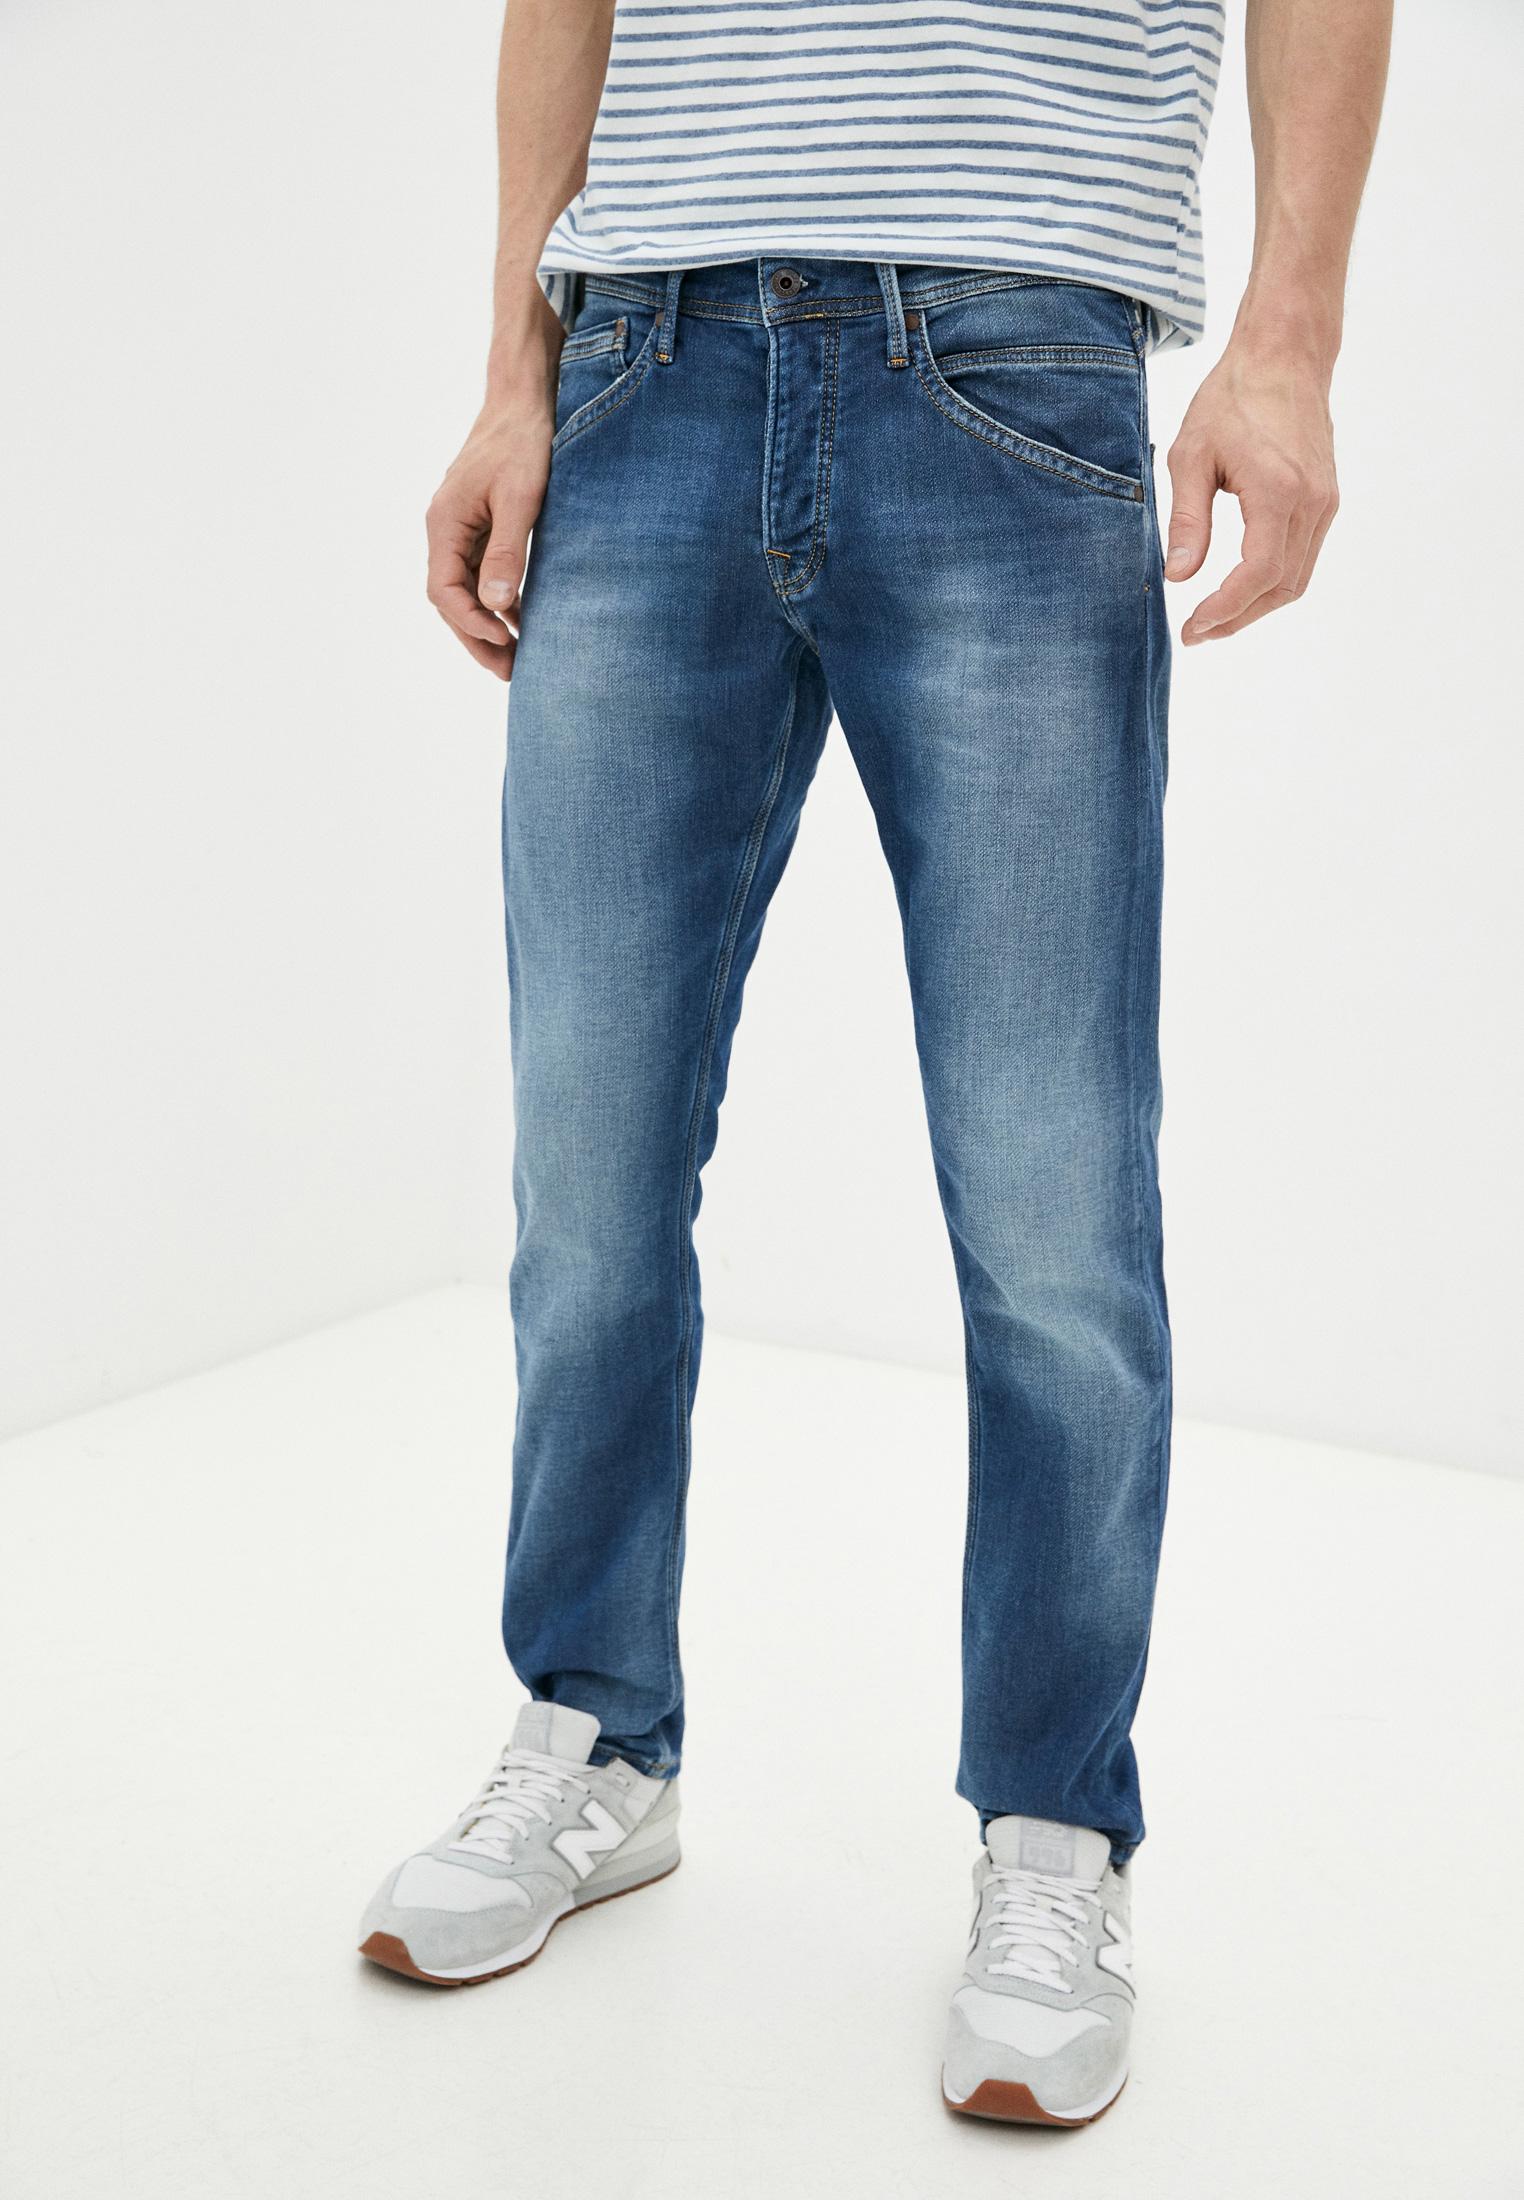 Зауженные джинсы Pepe Jeans (Пепе Джинс) PM201100HB1